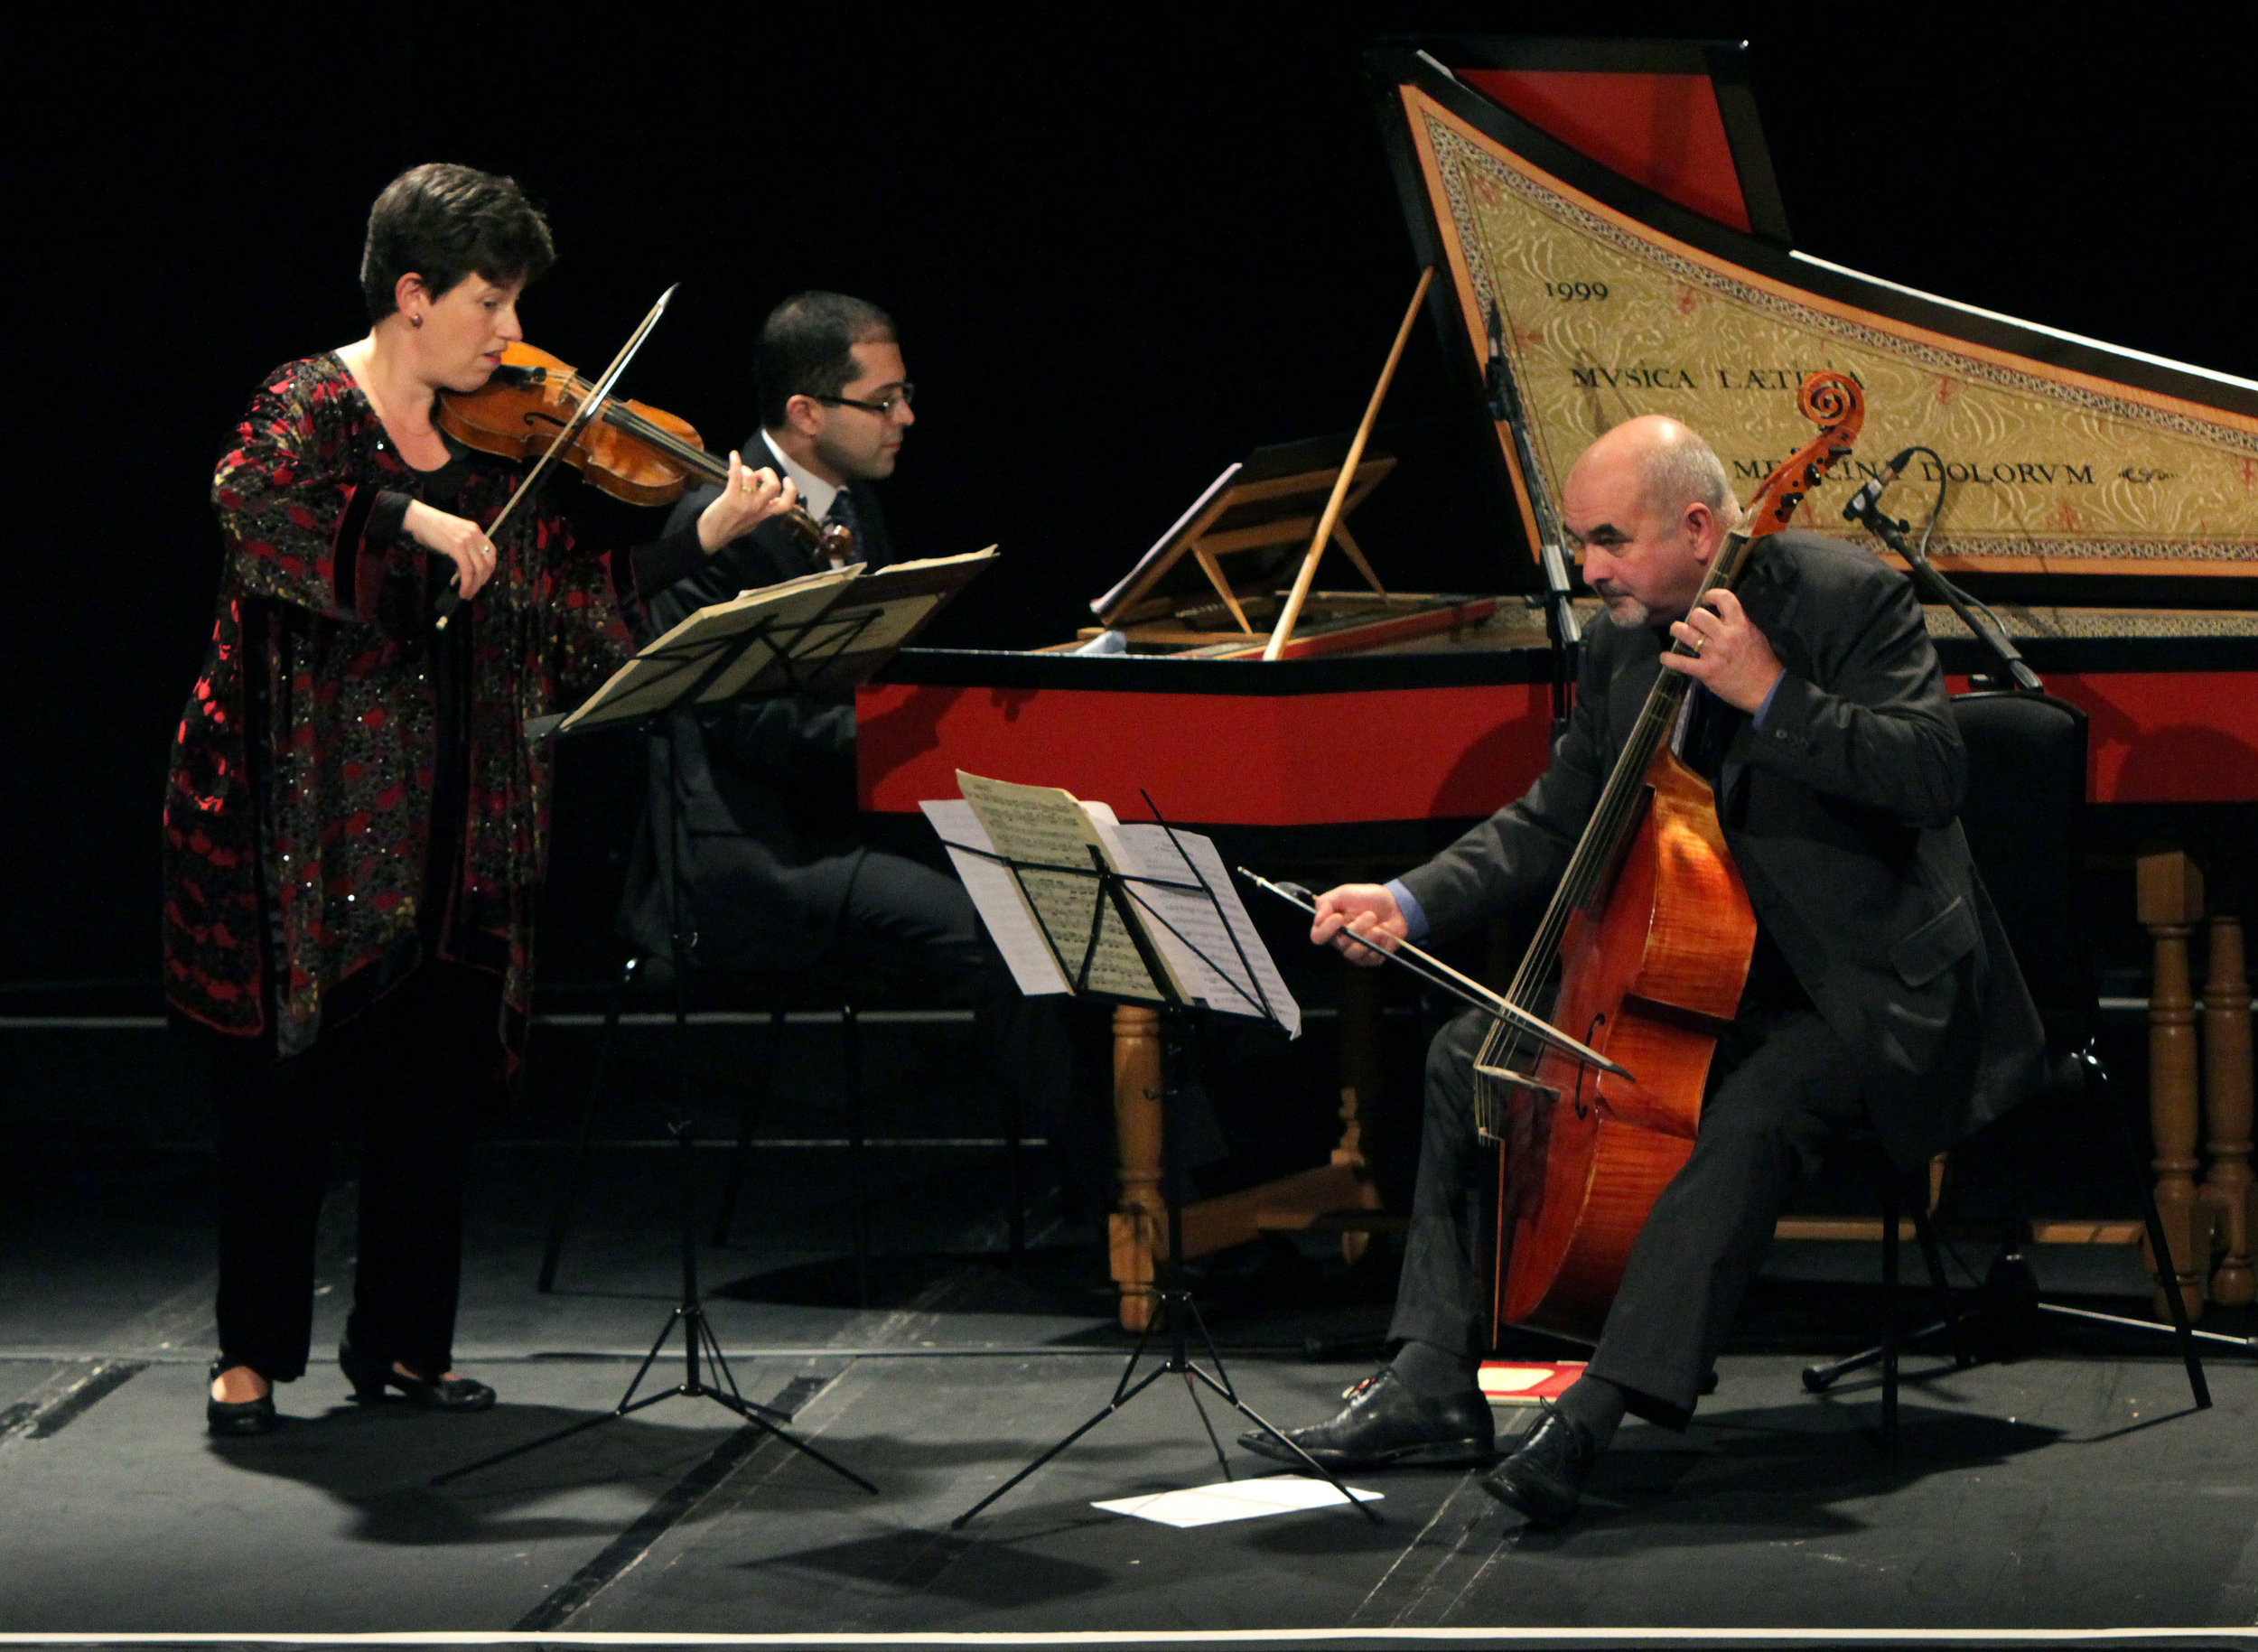 PARIS:AGE OF ENLIGHTENMENT - october 14, 2014. 20th Century theater, londonMahan Esfahani, harpsichord Kati Debretzeni, violin Richard Boothby, viola da gamba Illustrated talk by Philipp BlomMarais - La Sonnerie de Ste Geneviève du Mont-de-Paris (The Bells of St Genevieve)Leclair - Sonata in C minor, Op. 5, No. 6 'Le Tombeau'Rameau - Concerts Nos. 3 & 5 from the Pièces de clavecin en concertsA. Forqueray - La Forqueray, La Leclair, La Rameau from the Pièces de viole avec la basse continueC.P.E. Bach - Keyboard Sonata in F sharp minor, Wq 52/4